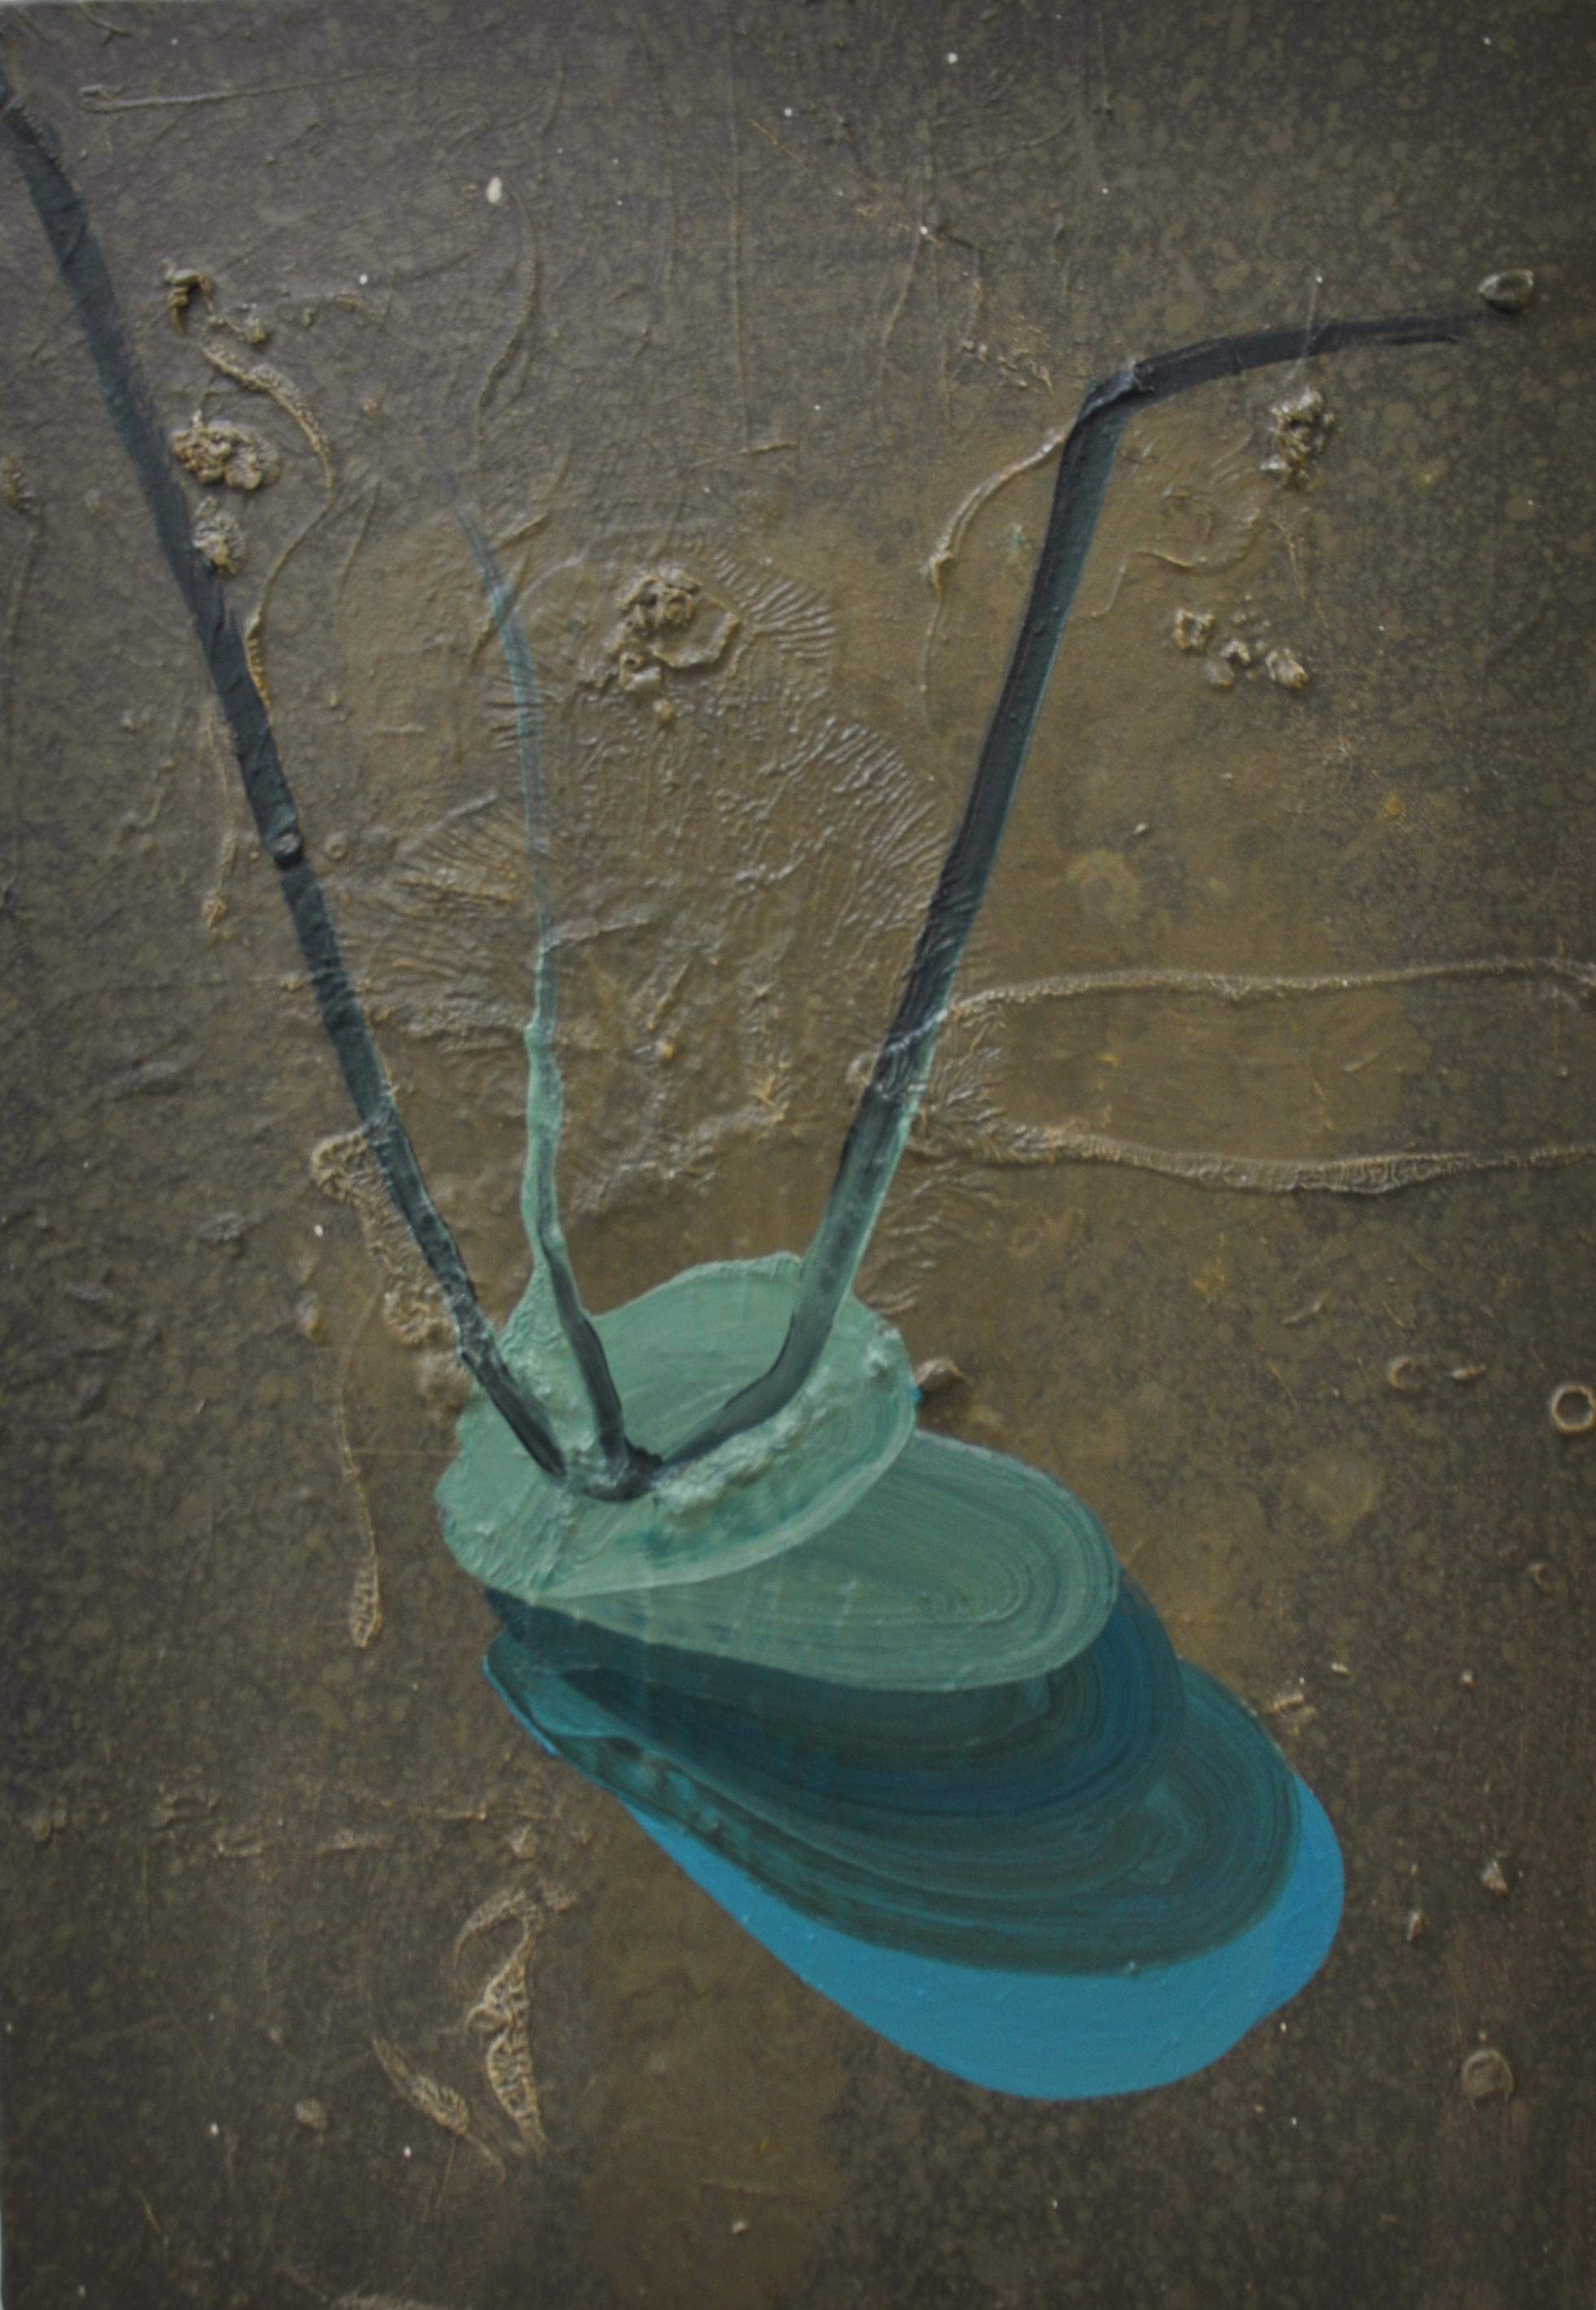 Plummet, 2011, Oil on canvas, 51 x 36 cm